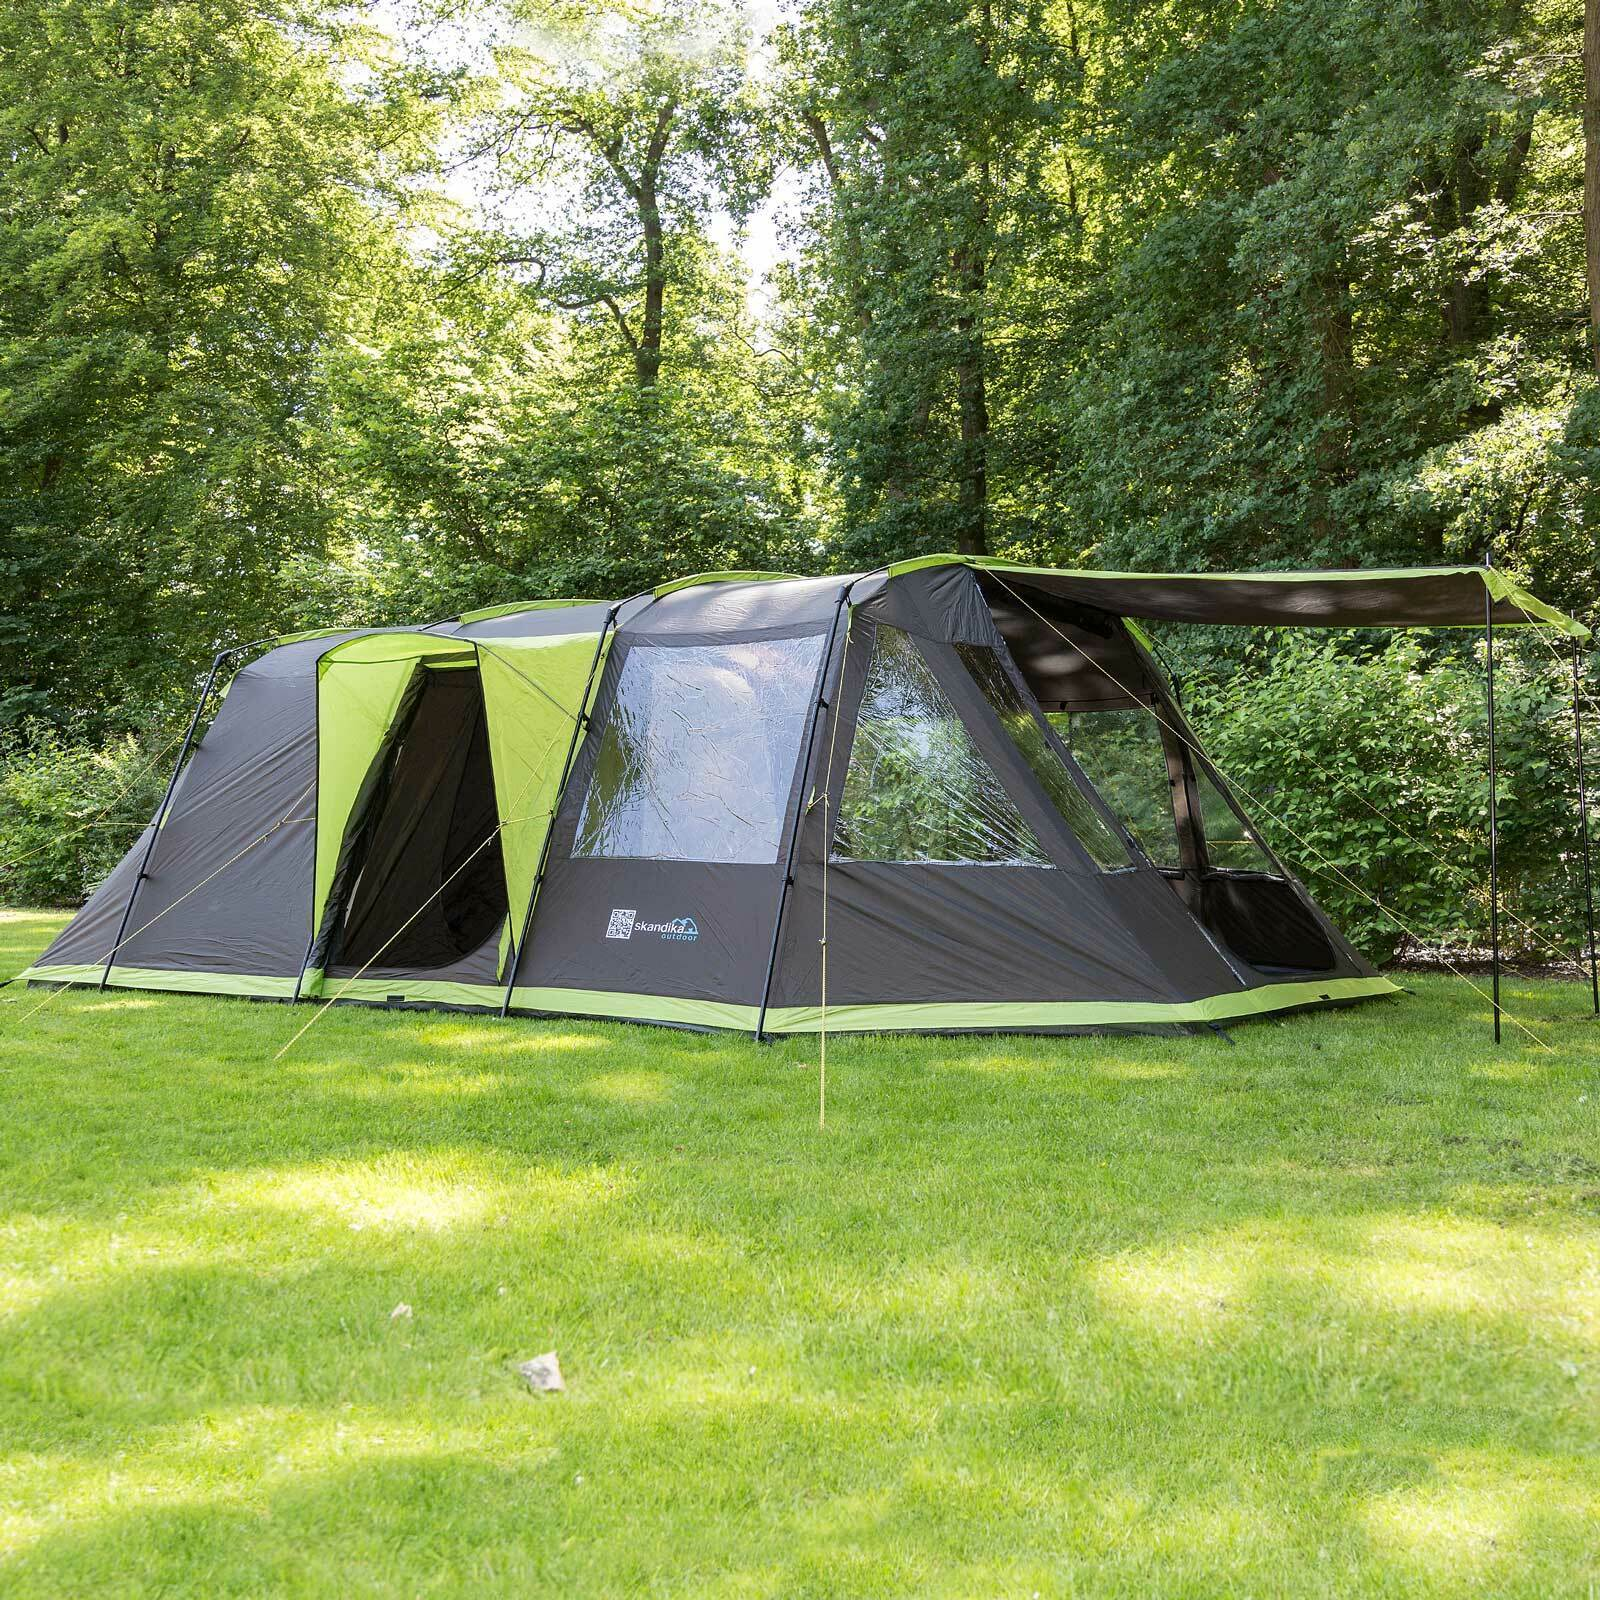 SKANDIKA NORDLAND 6 personne homme famille tente cousu dans sol Camping anthrazite New